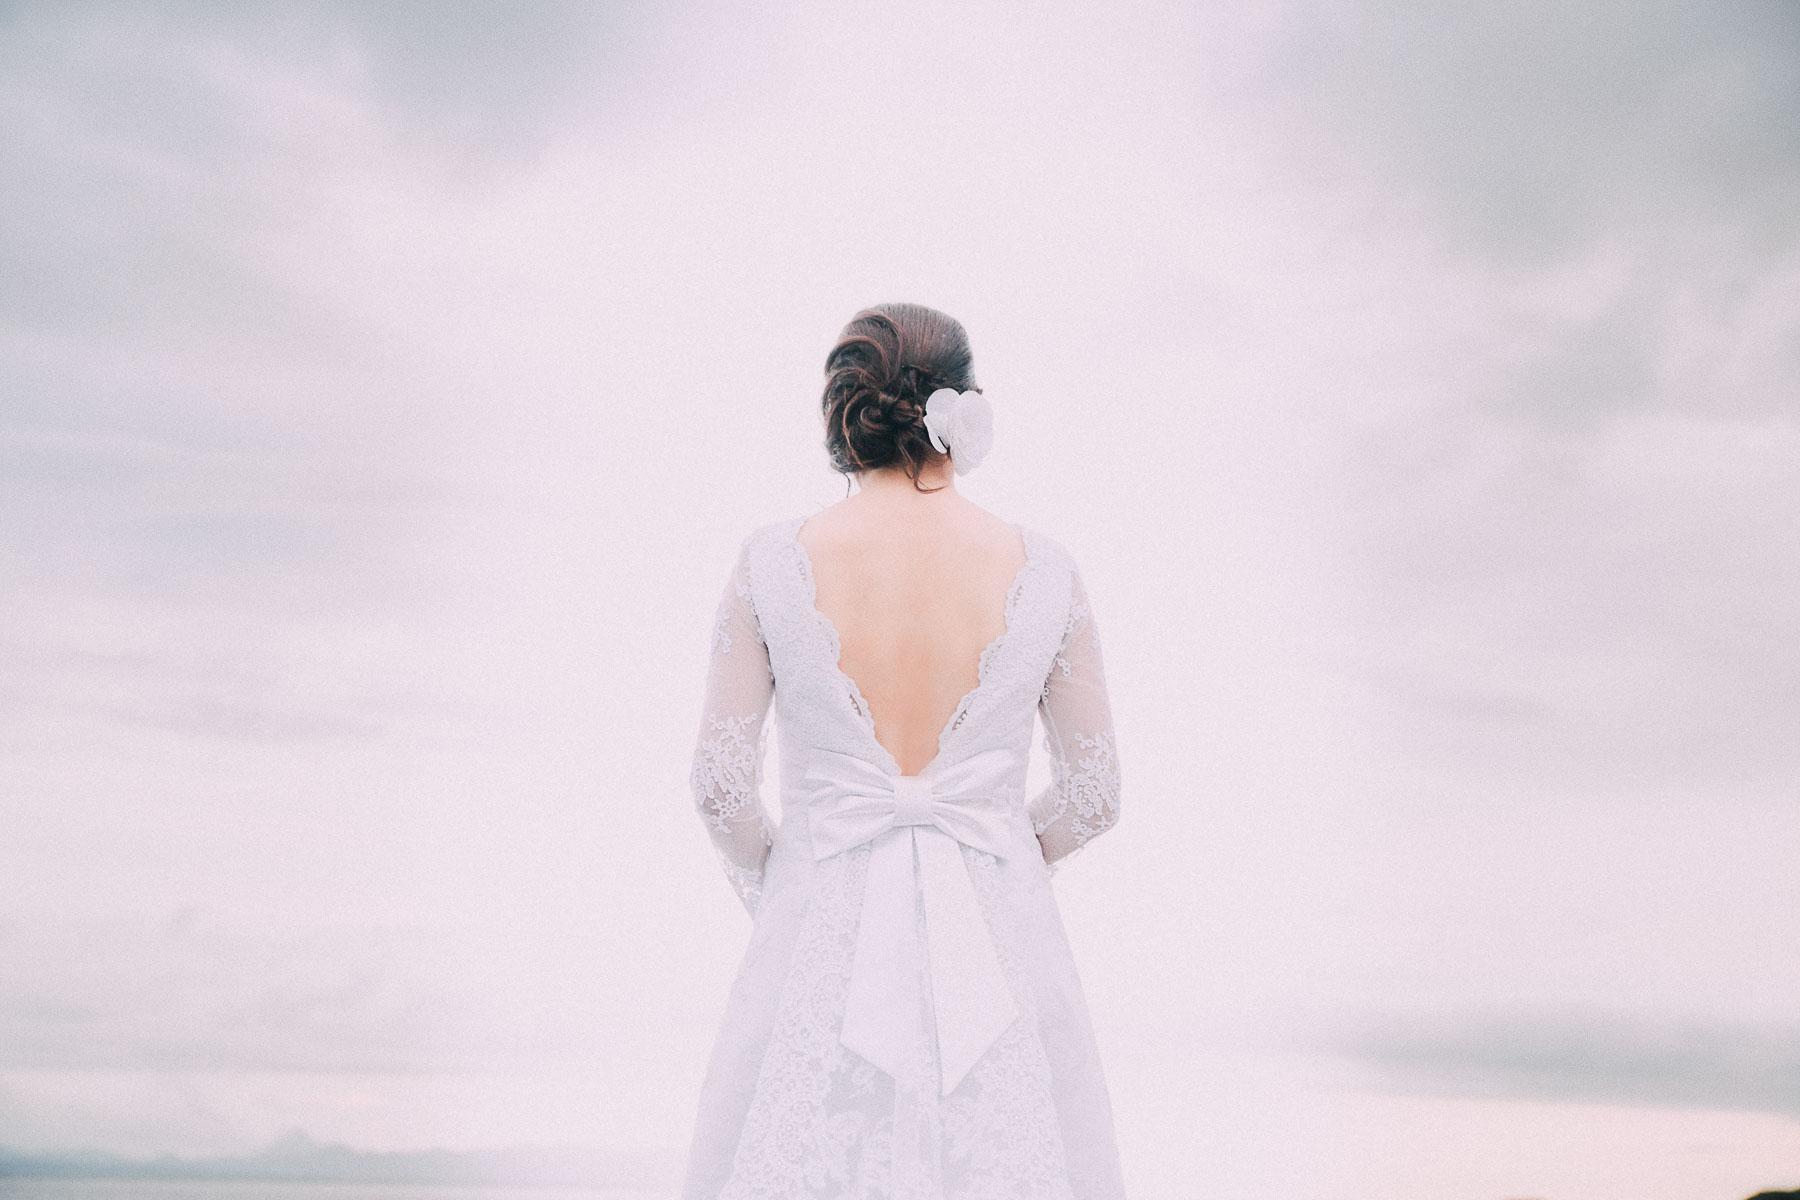 destination-wedding-in-lake-aitoliko-messolonghi-in-greece080